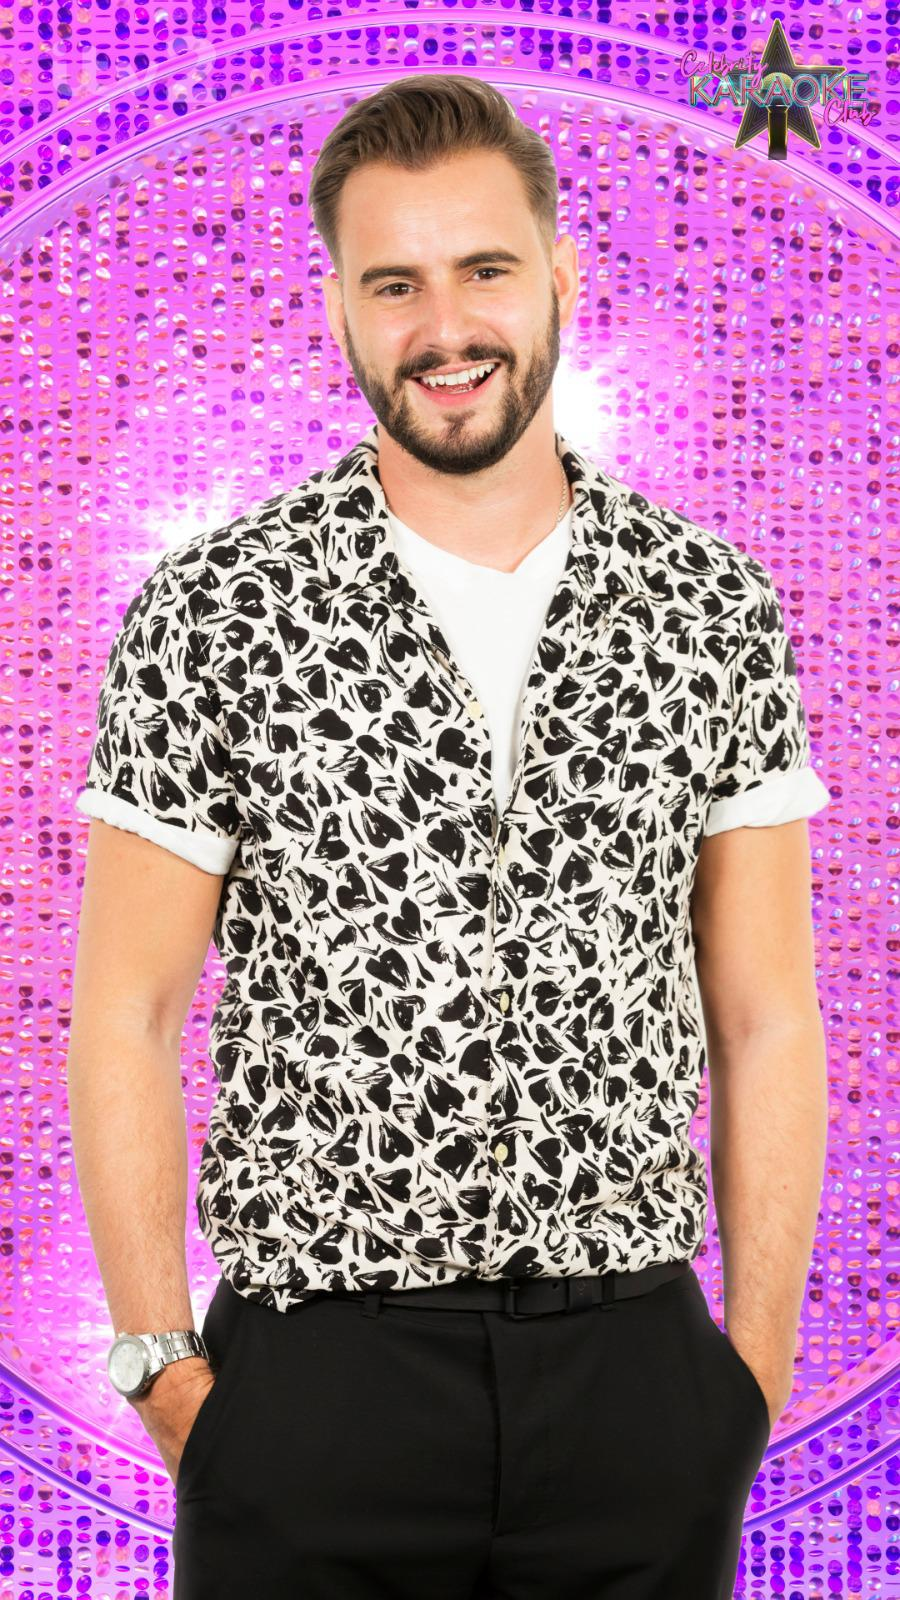 Luke Kempner, ITV2 Celebrity Karaoke